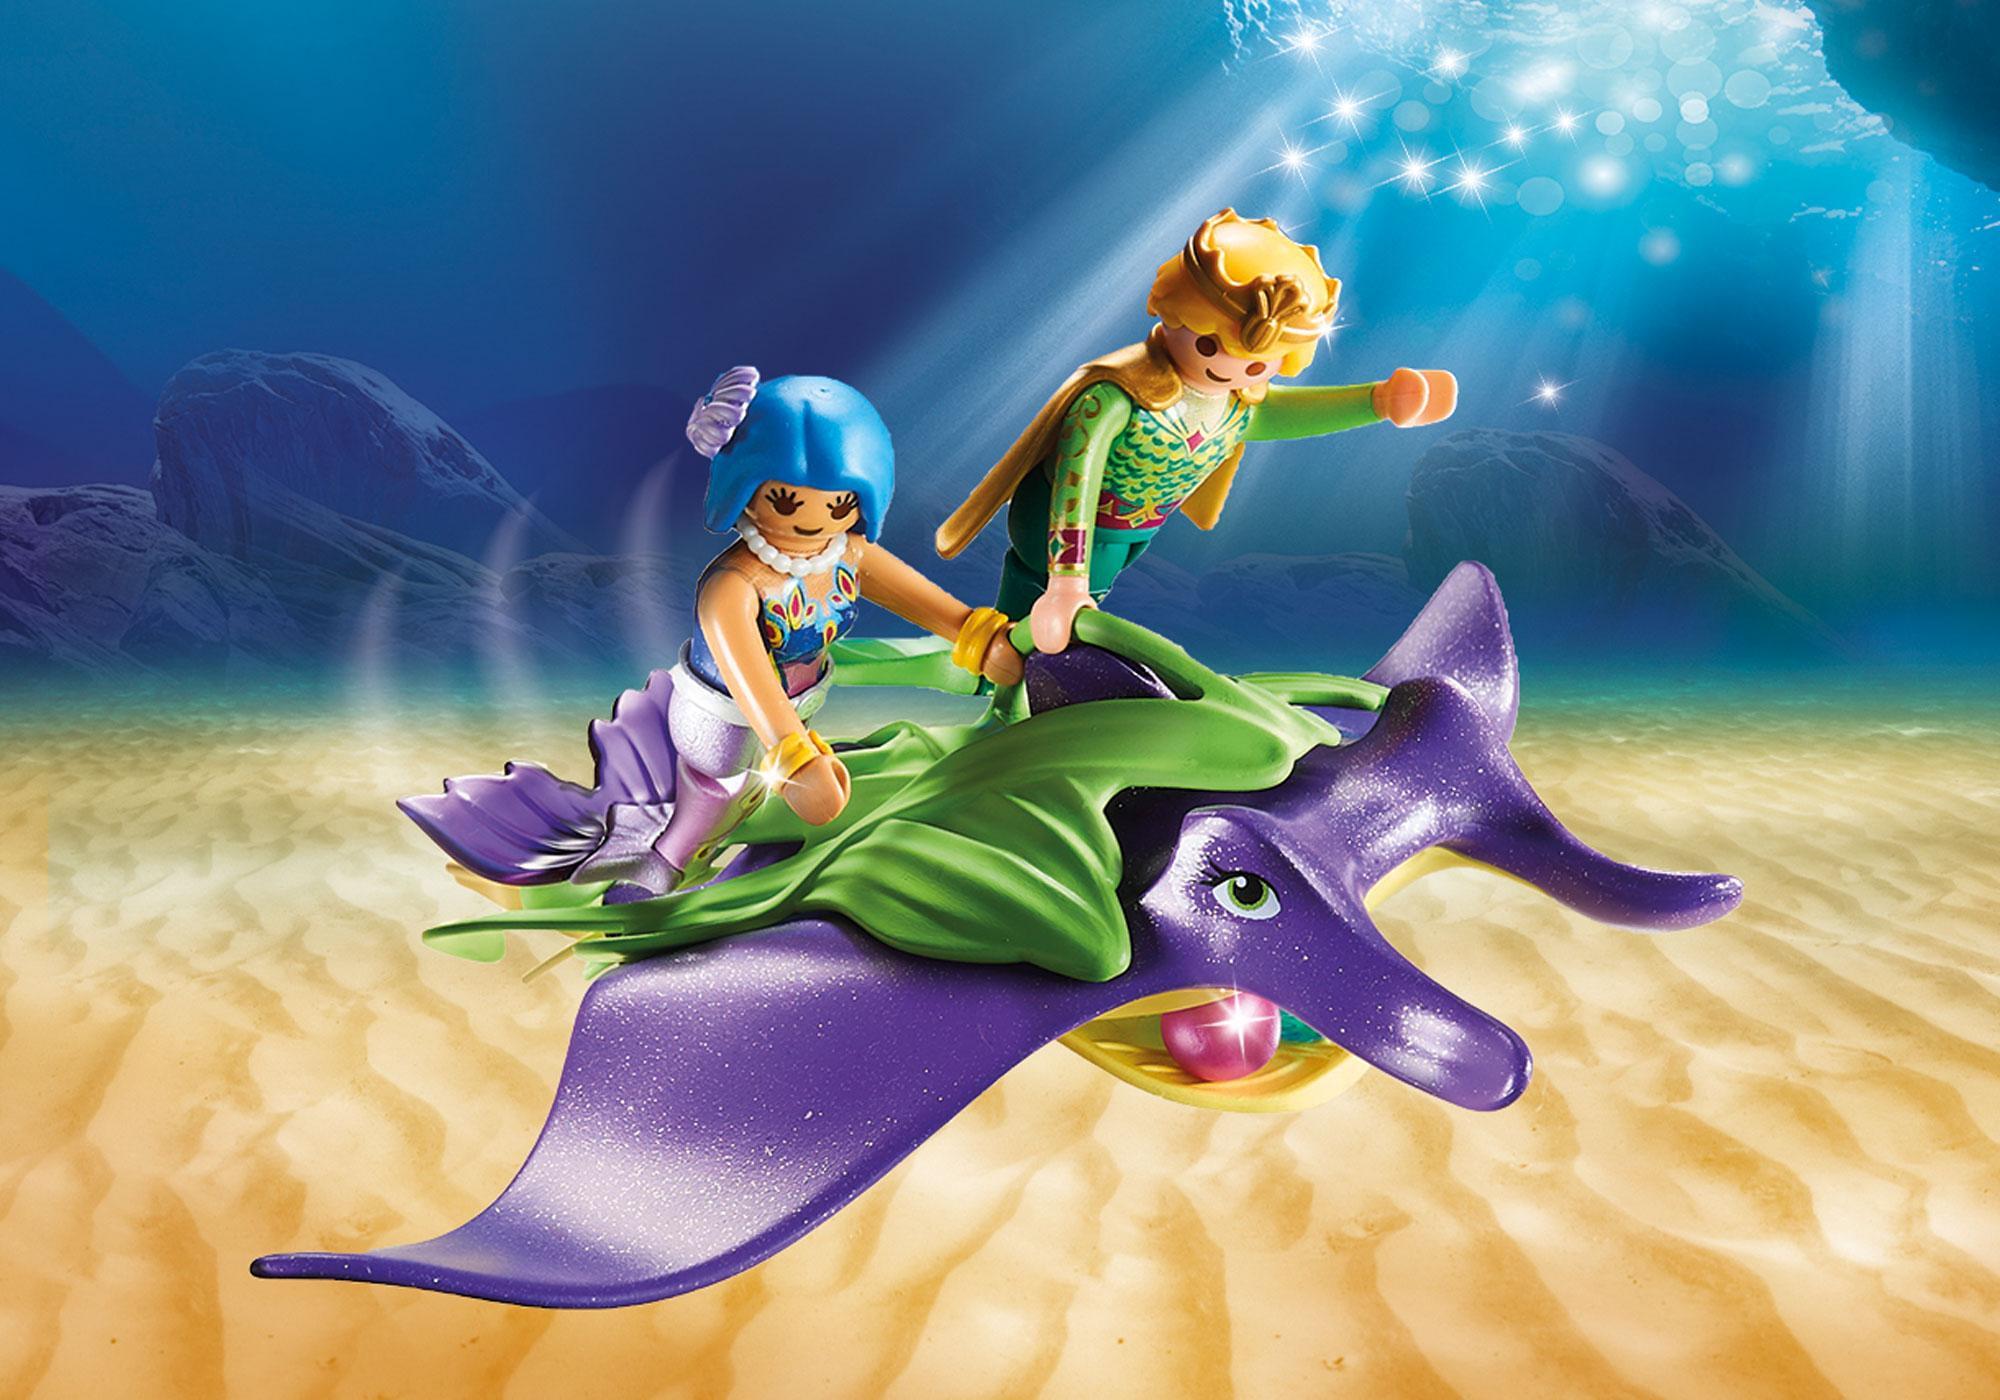 http://media.playmobil.com/i/playmobil/70099_product_extra1/Chercheurs de perles et raies